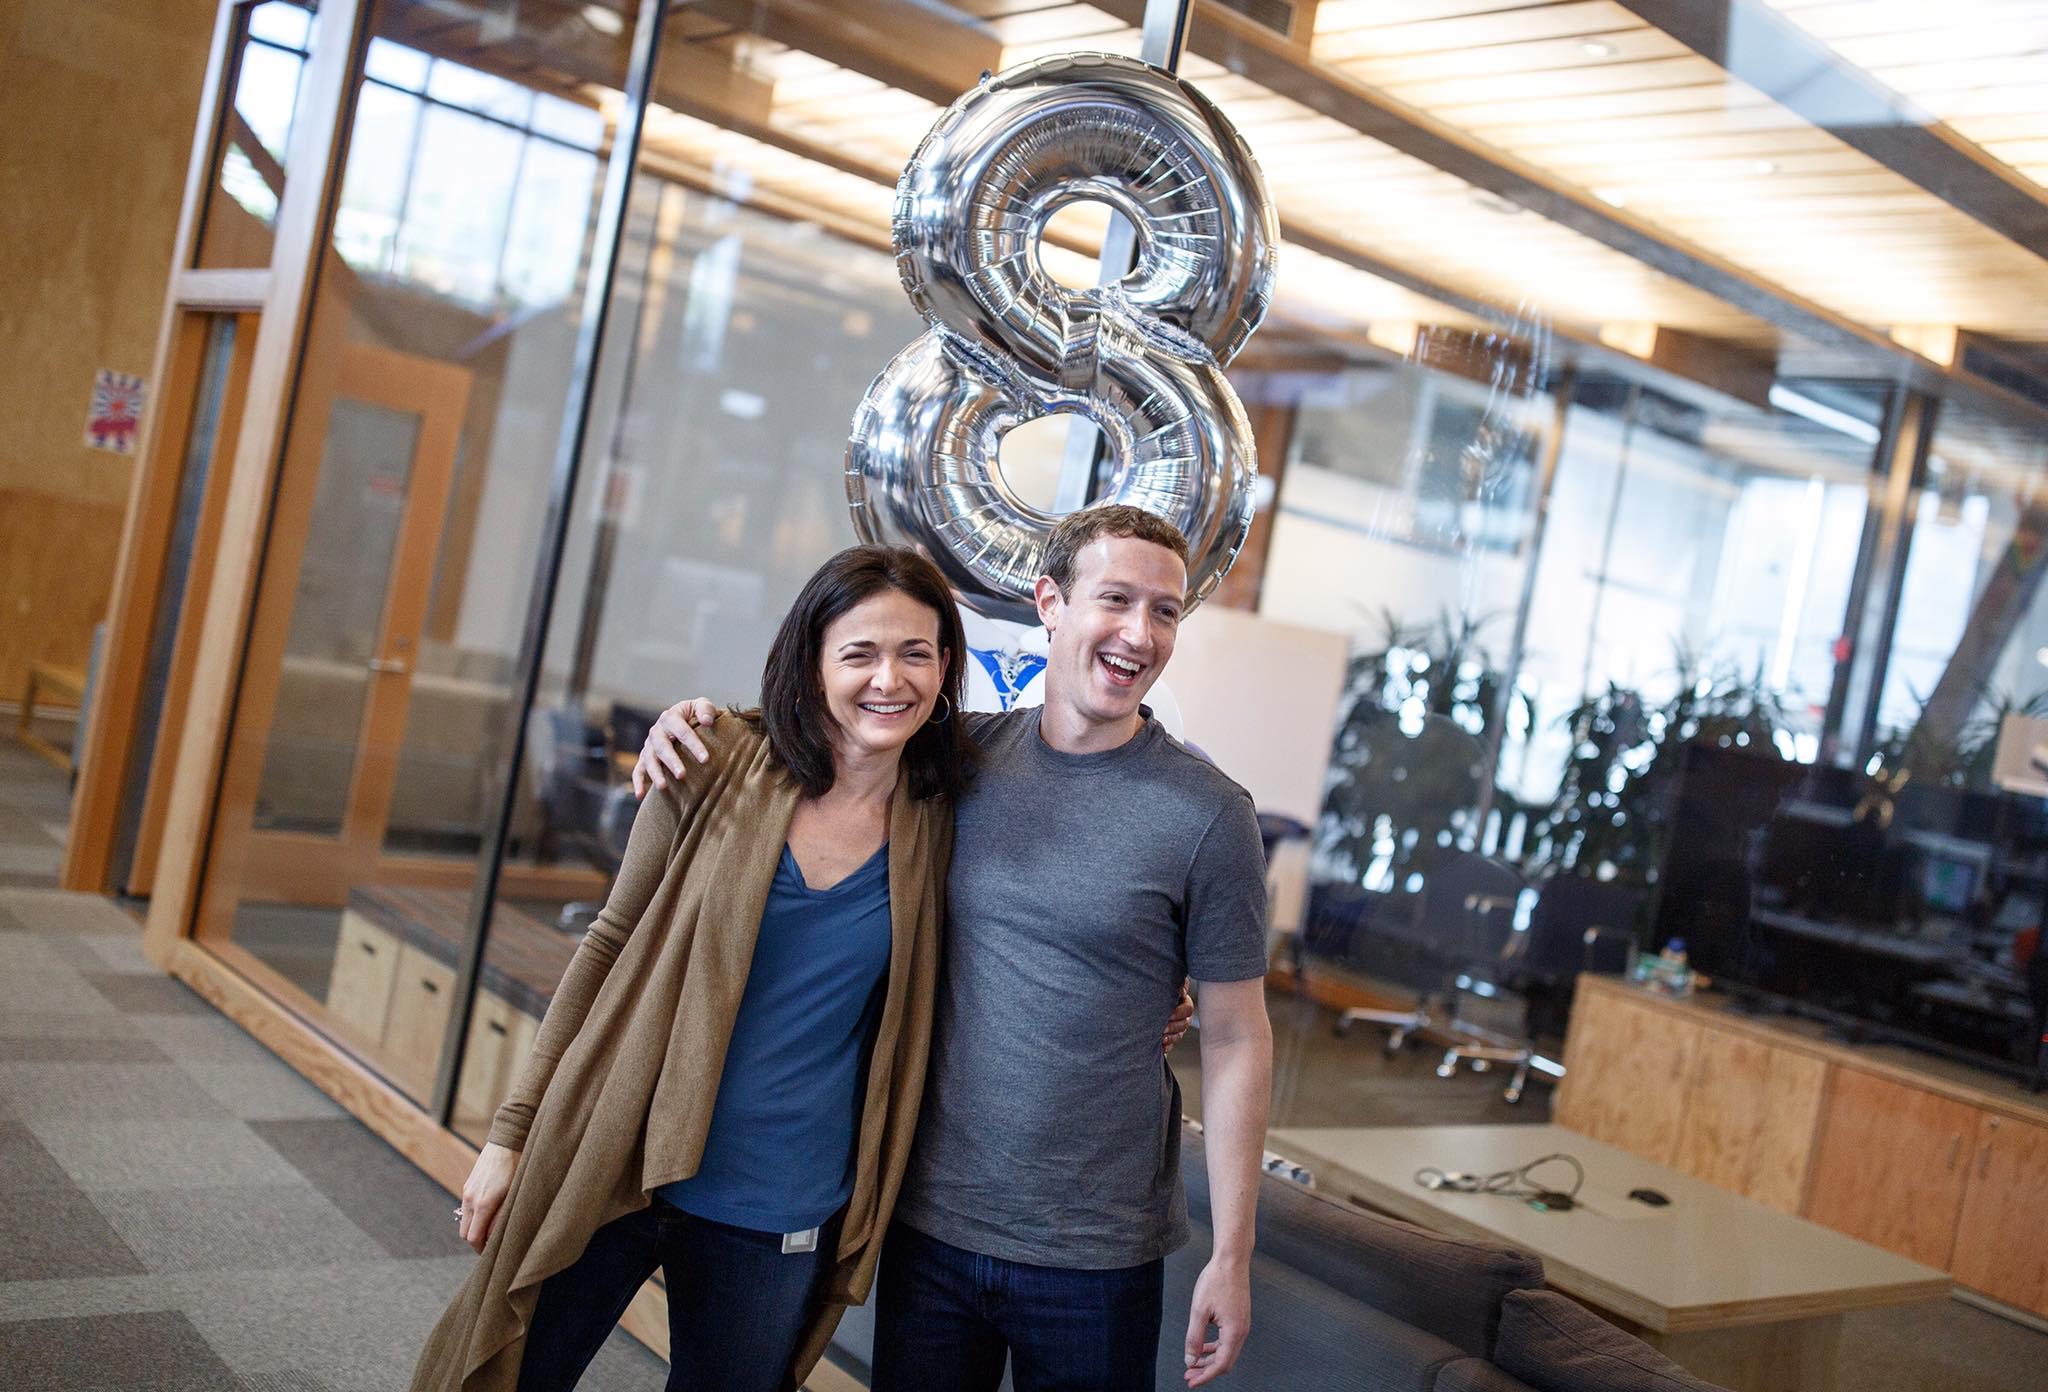 Facebook COO Sheryl Sandberg celebrates her eight-year anniversary with CEO Mark Zuckerberg.